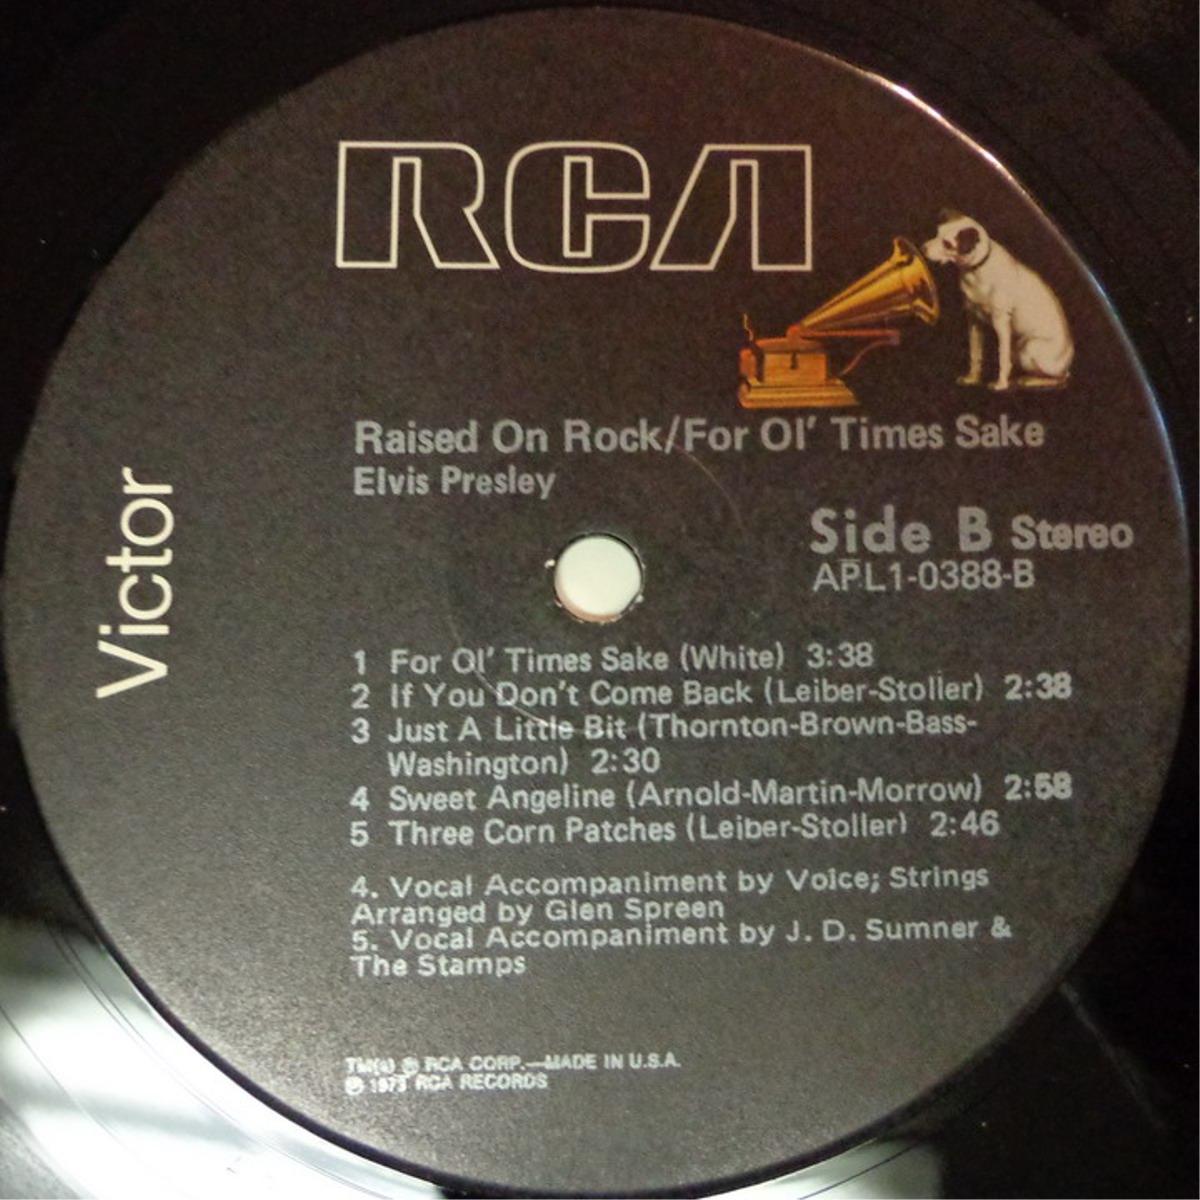 RAISED ON ROCK / FOR OL' TIMES SAKE Apl1-0388d7vsu4